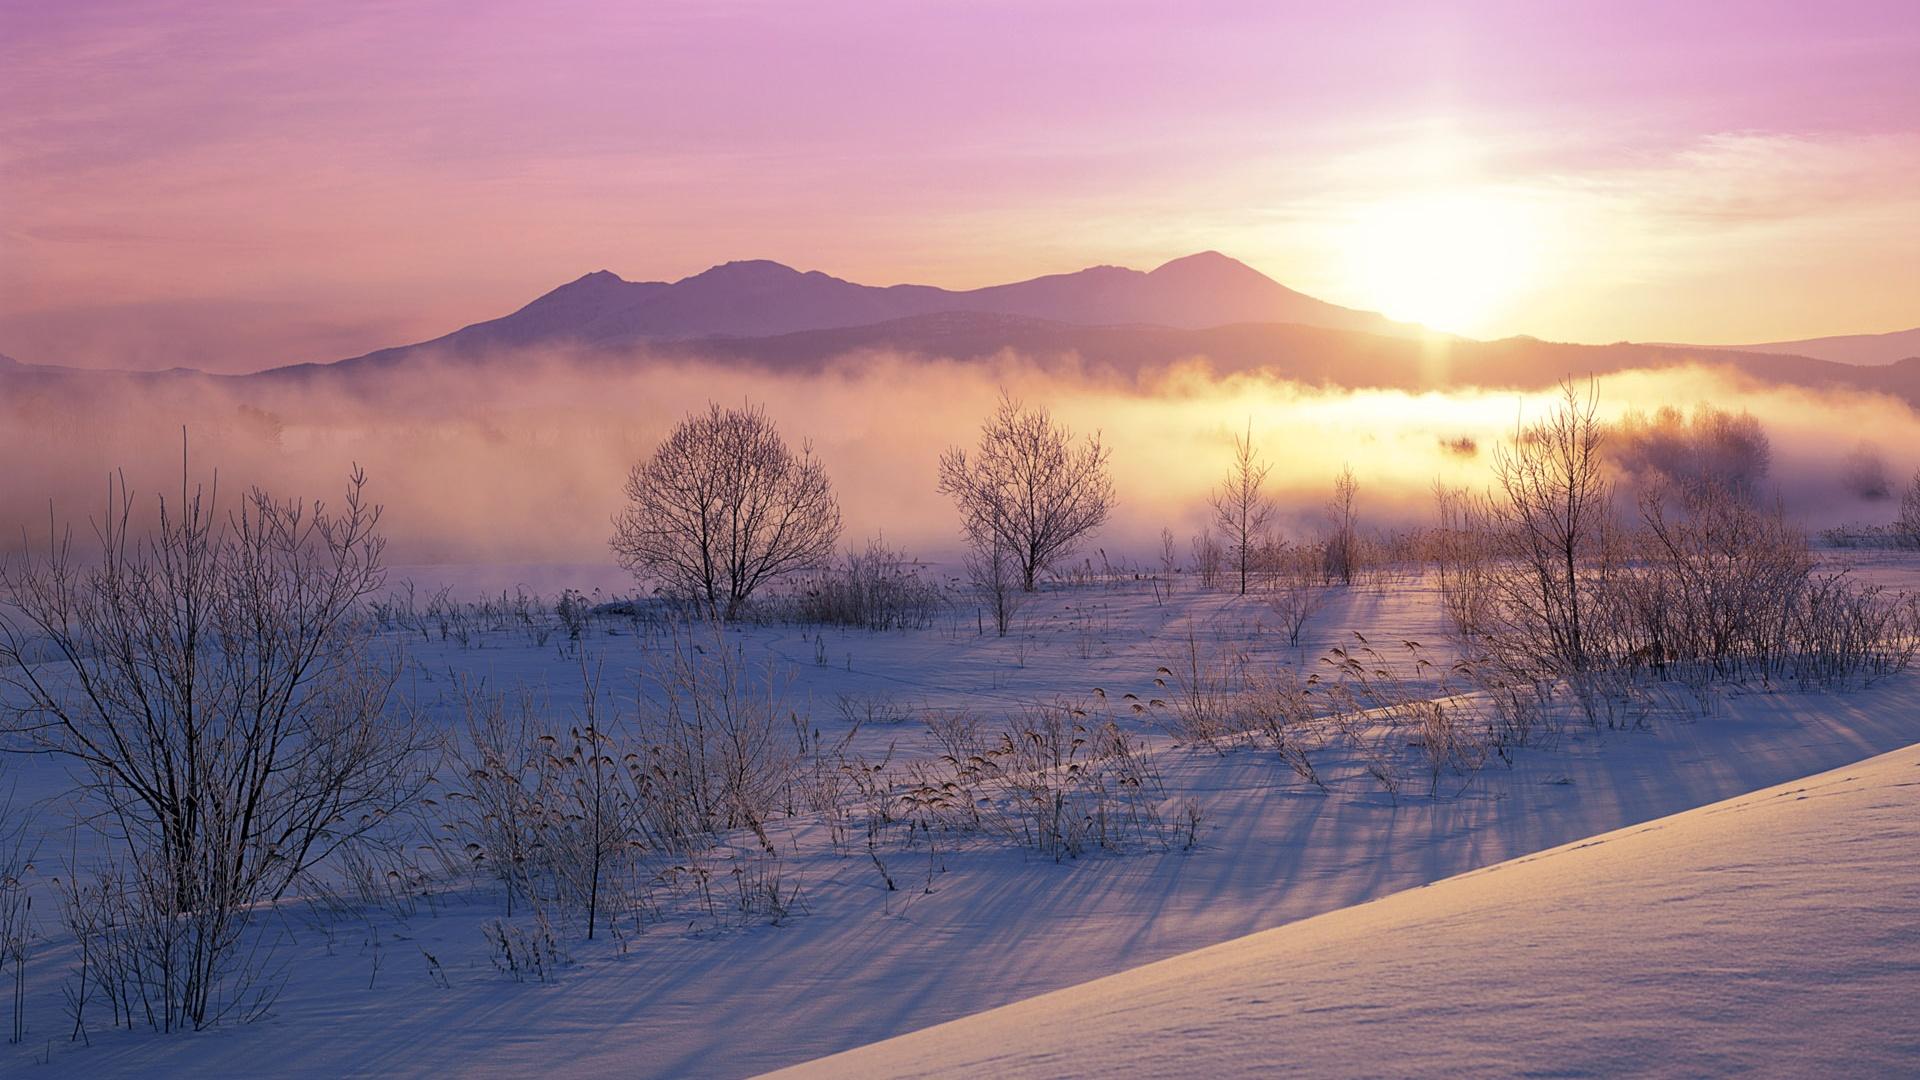 Wallpaper japan winter nature dusk snow 1920x1200 hd - Wallpaper hd nature winter ...